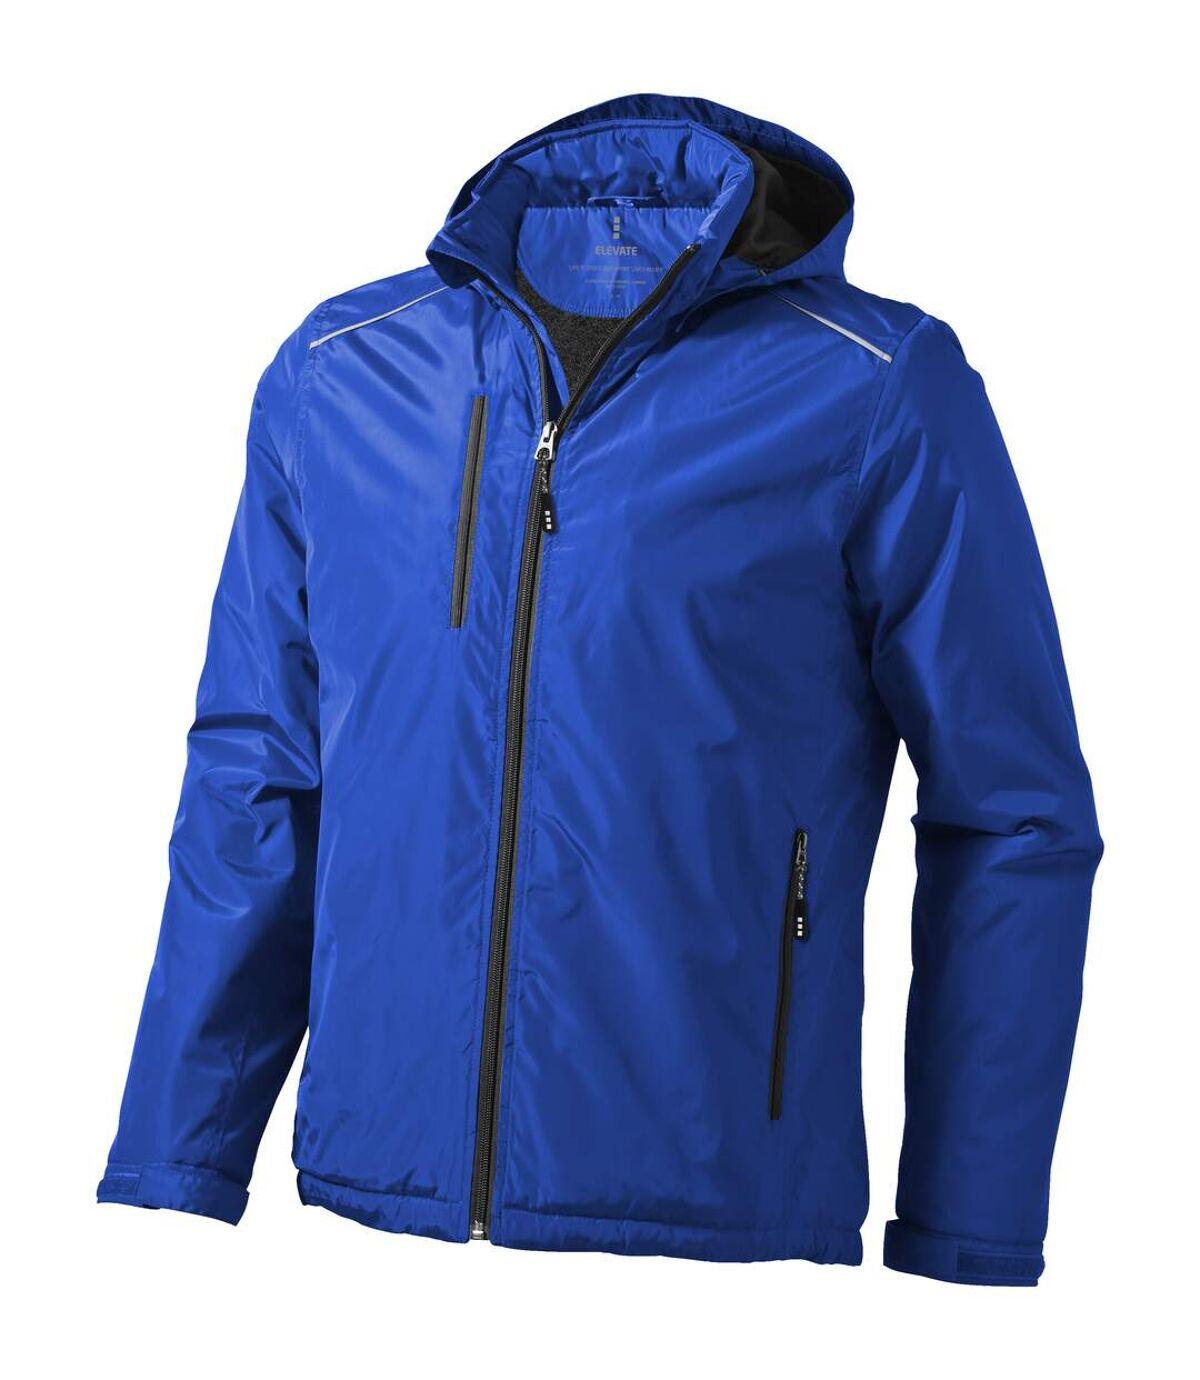 Elevate Mens Smithers Fleece Lined Jacket (Blue) - UTPF1909